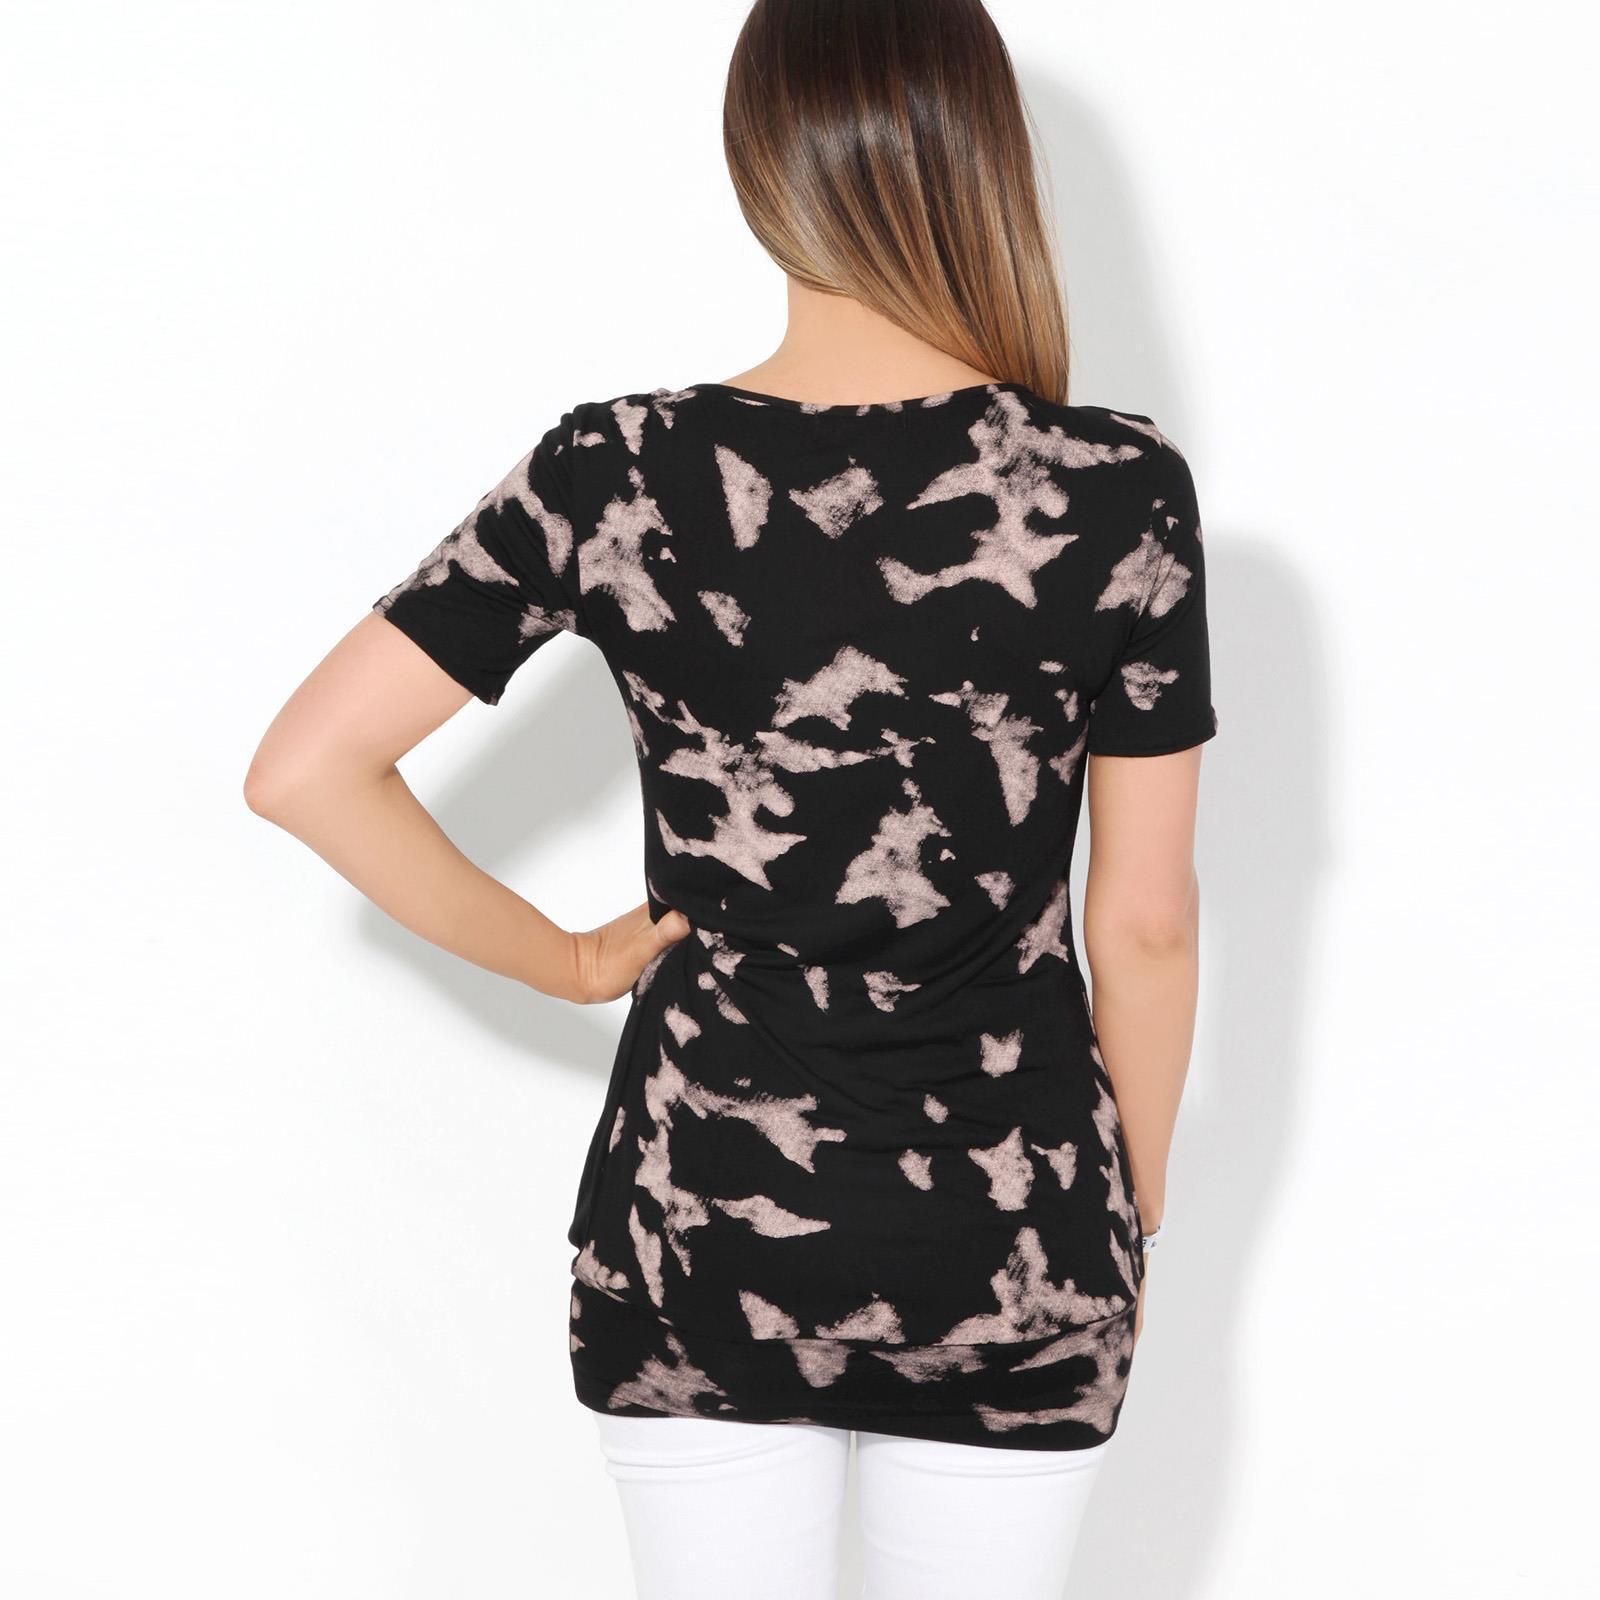 Womens-Ladies-Pattern-T-Shirt-Camo-Print-Blouse-Scoop-Neck-Baggy-Long-Top-Tunic thumbnail 7